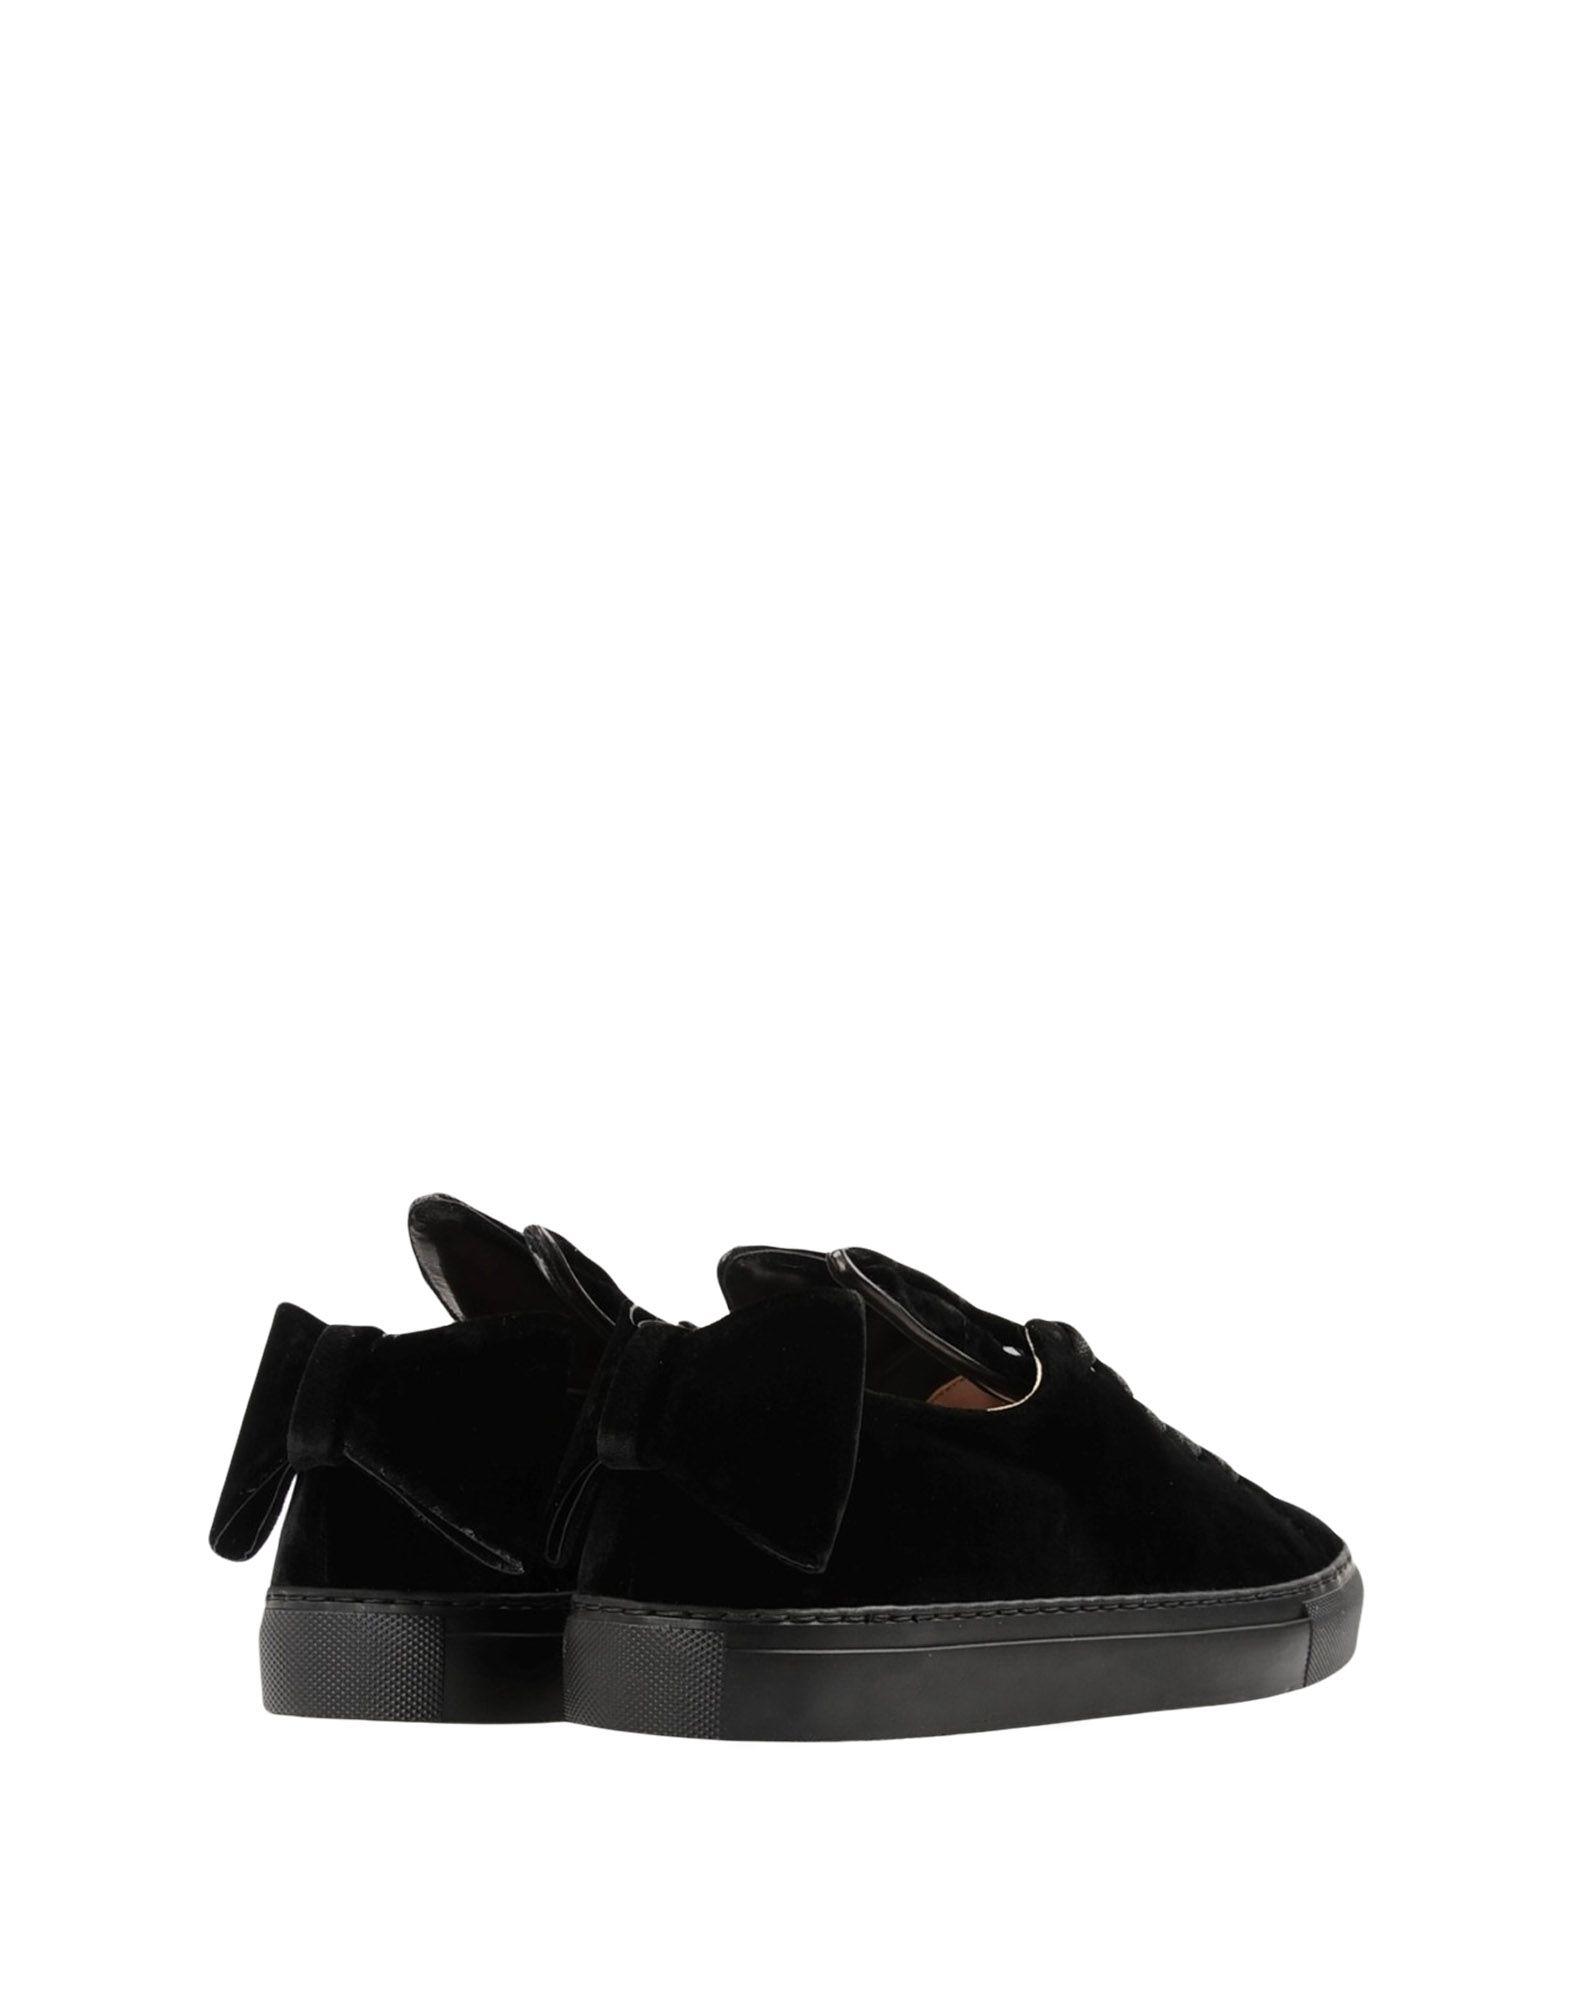 Sneakers Minna Parikka T-Bow - Femme - Sneakers Minna Parikka sur